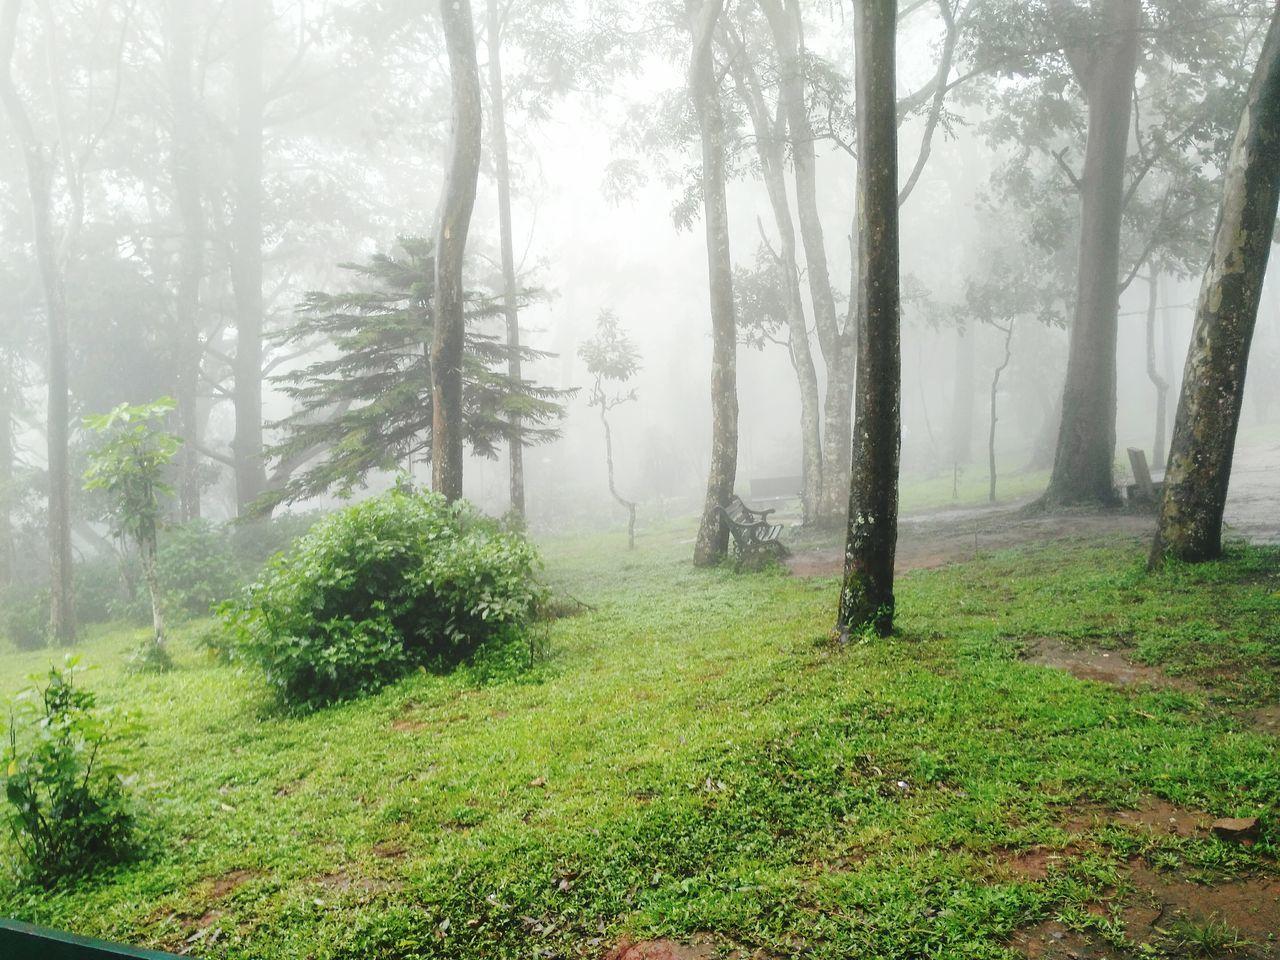 Grass Forest Scenics Weather Foggy Tree Plant Mist Nature Misty Day Non-urban Scene Fog